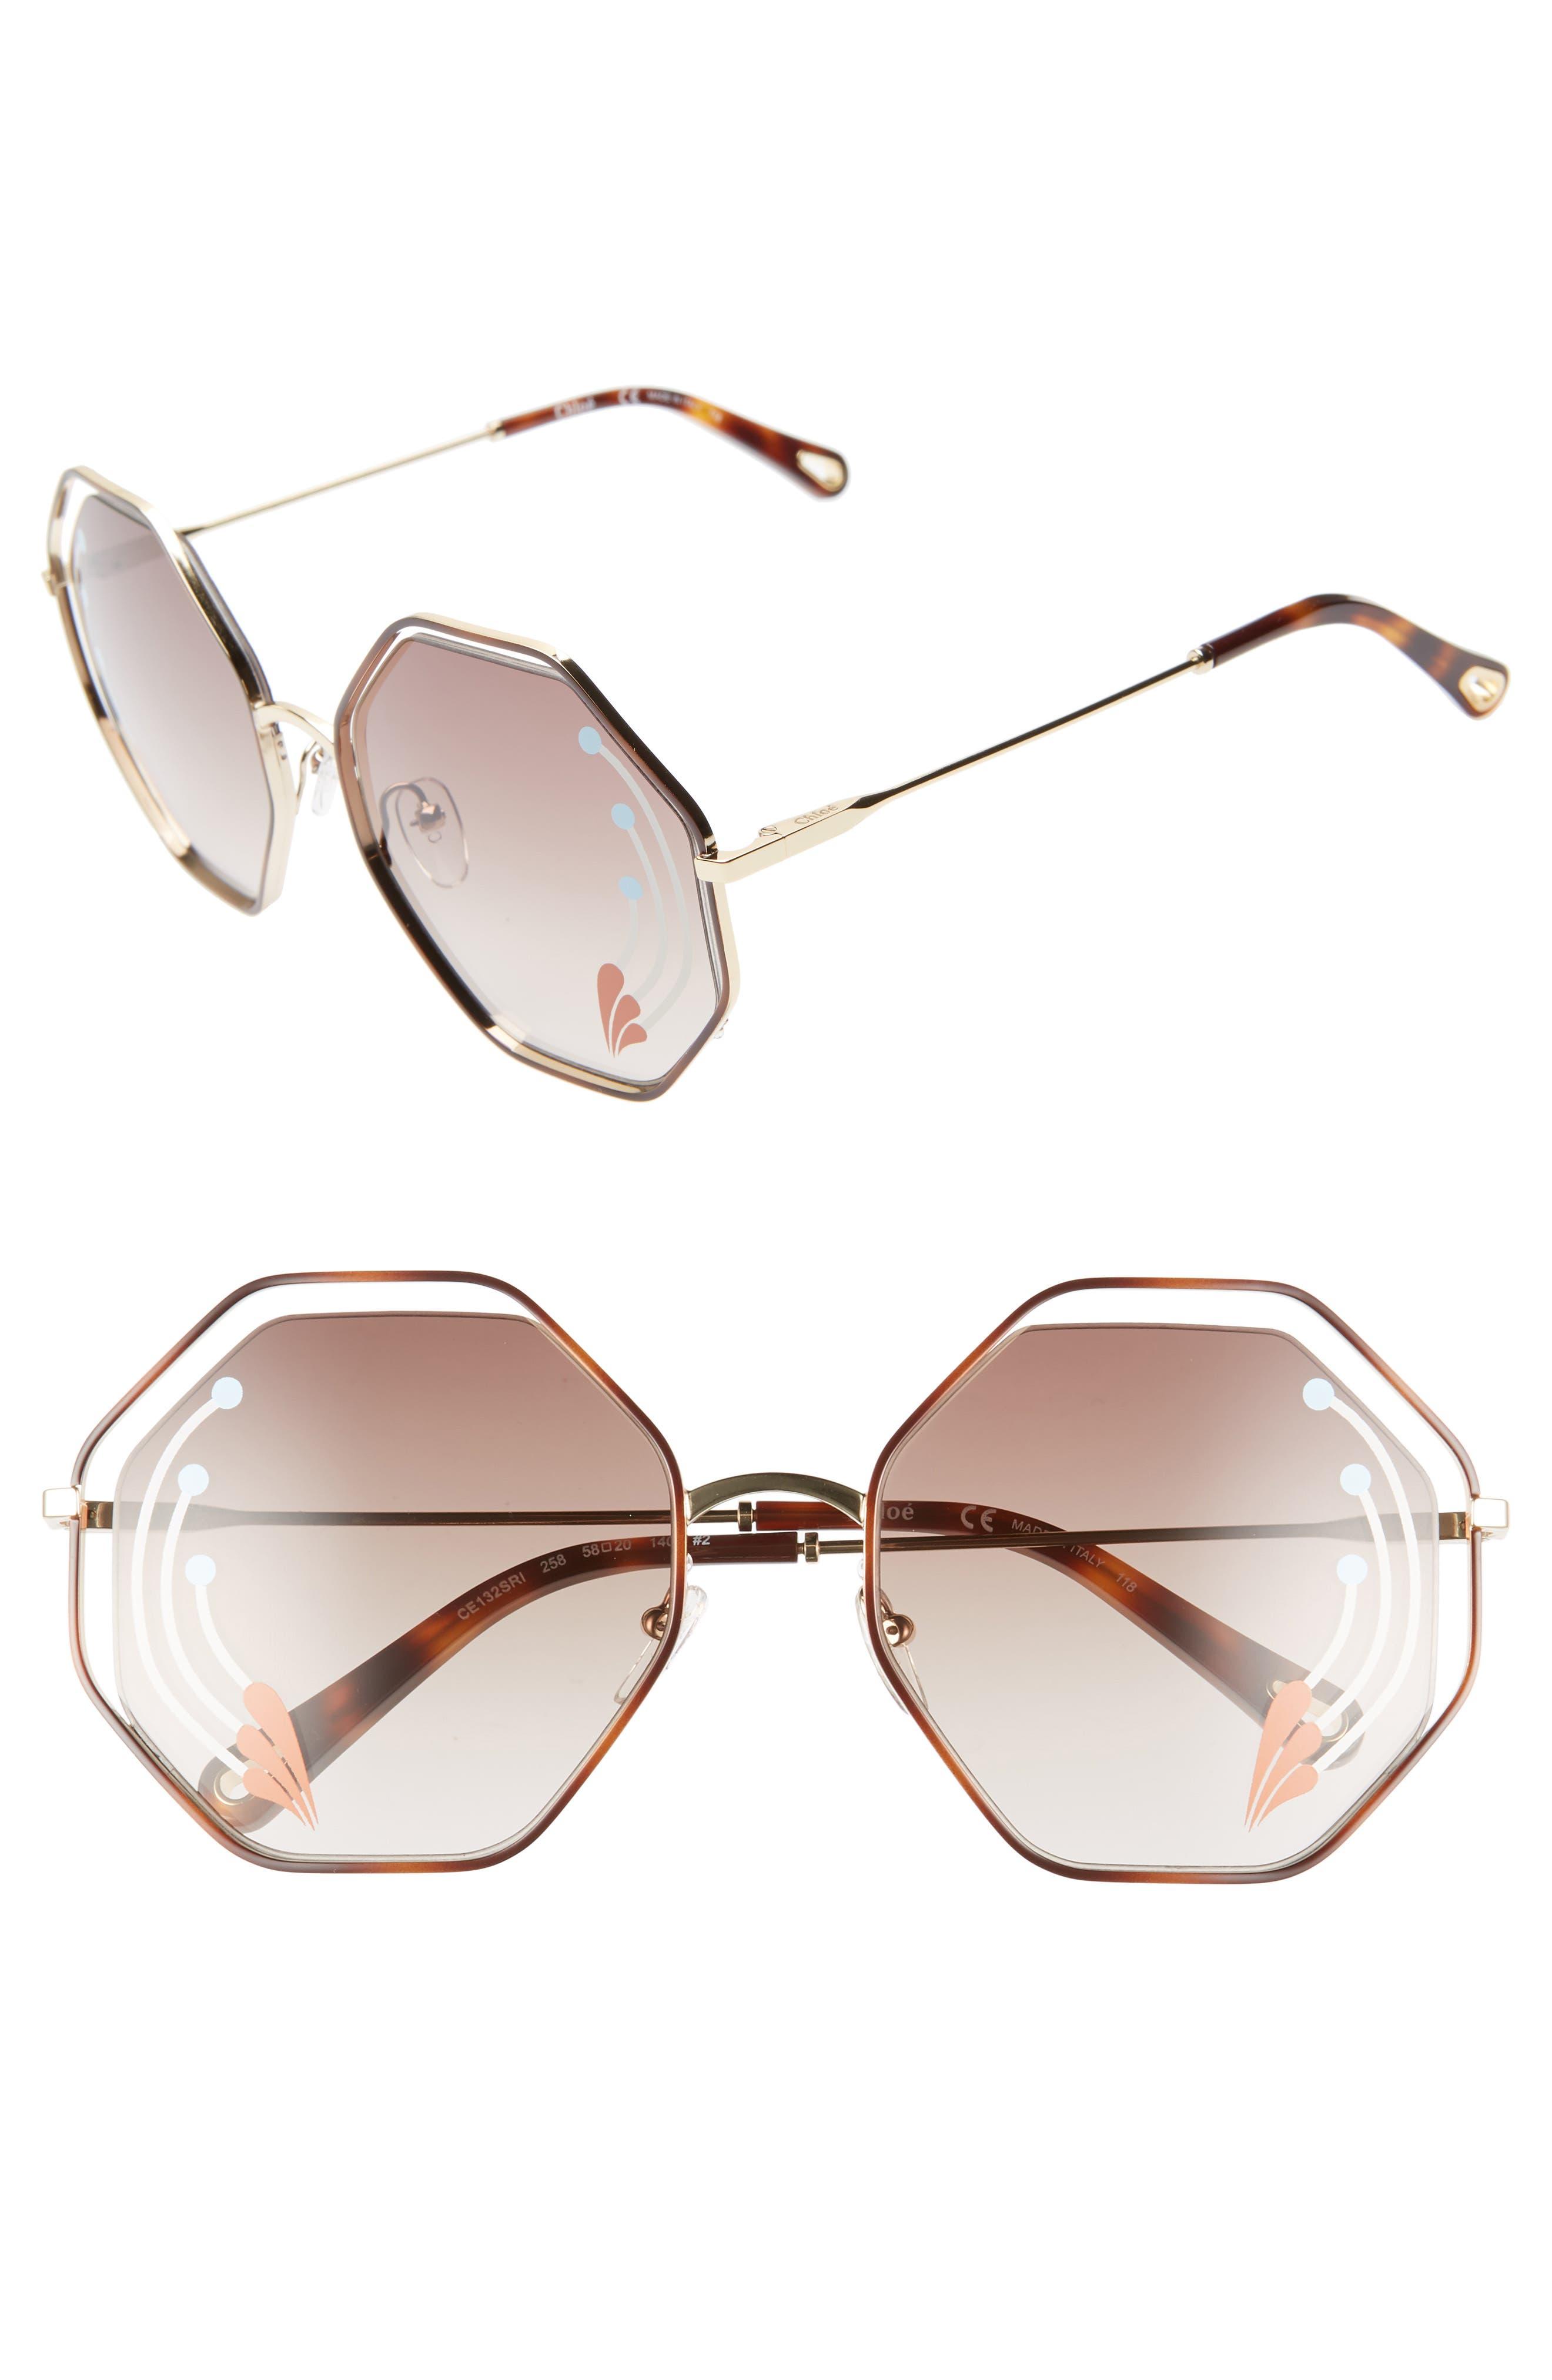 Poppy 58mm Octagonal Halo Lens Sunglasses,                             Main thumbnail 1, color,                             HAVANA/ GOLD BROWN W PRINT